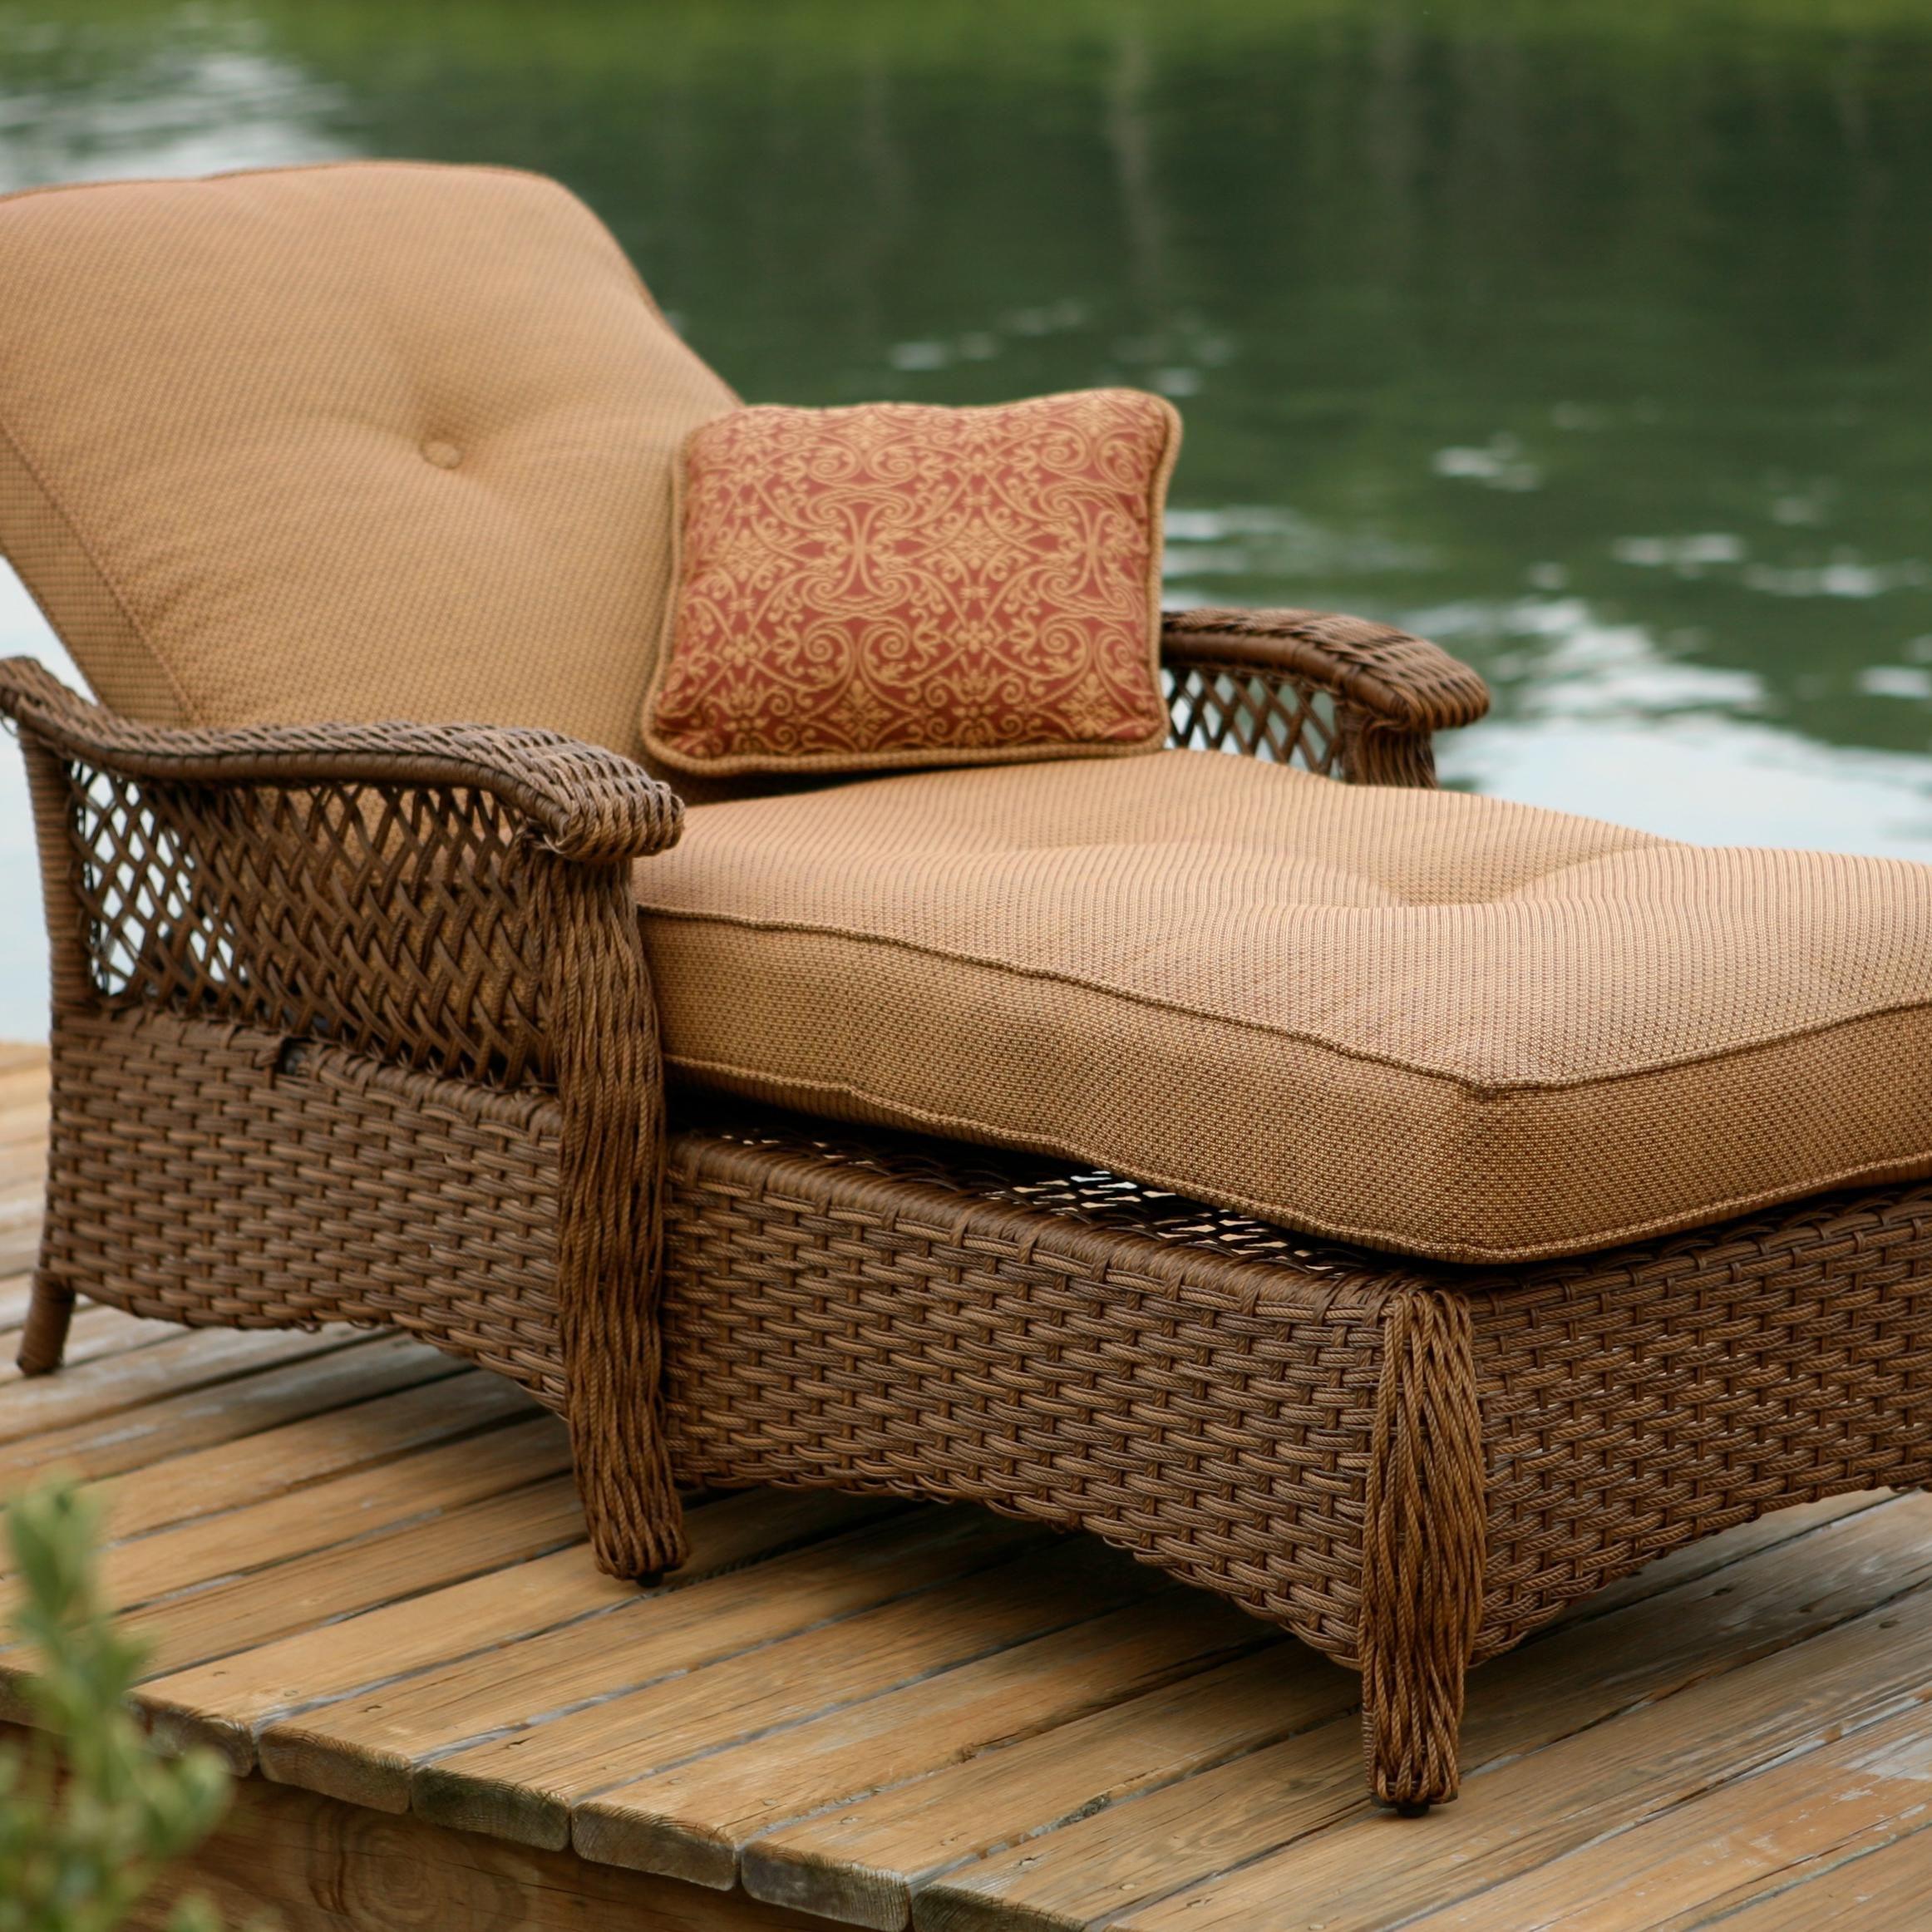 Veranda Agio Outdoor Woven Chaise Lounge By Agio Patio